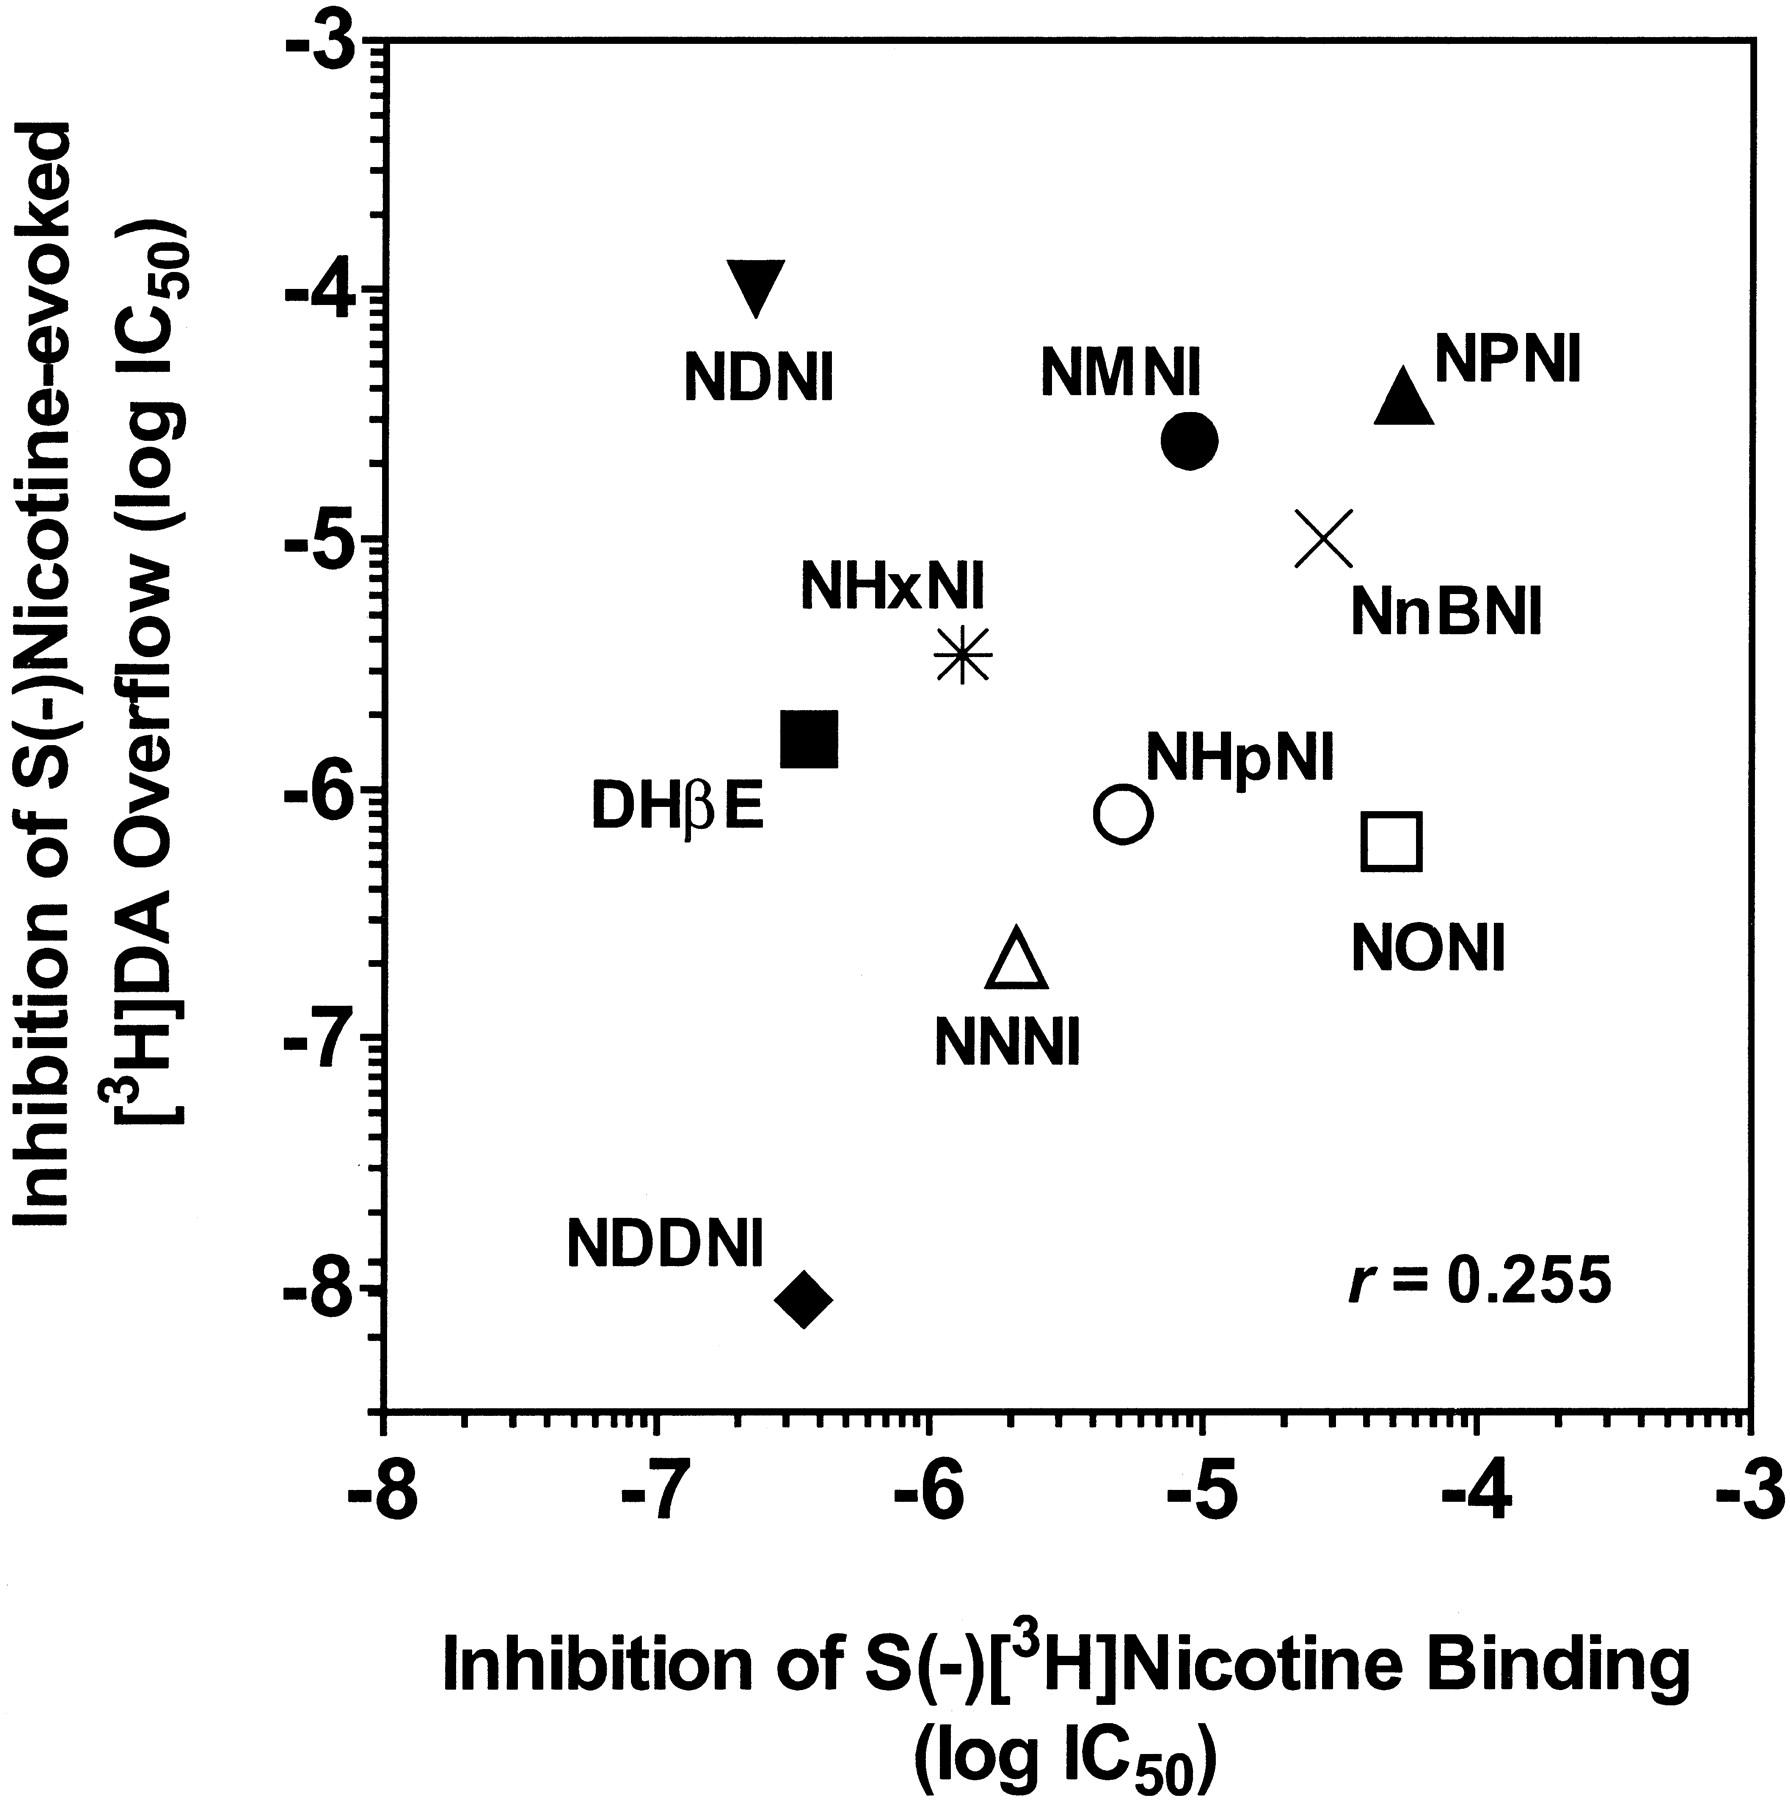 N-n-Alkylnicotinium Analogs, a Novel Class of Nicotinic Receptor